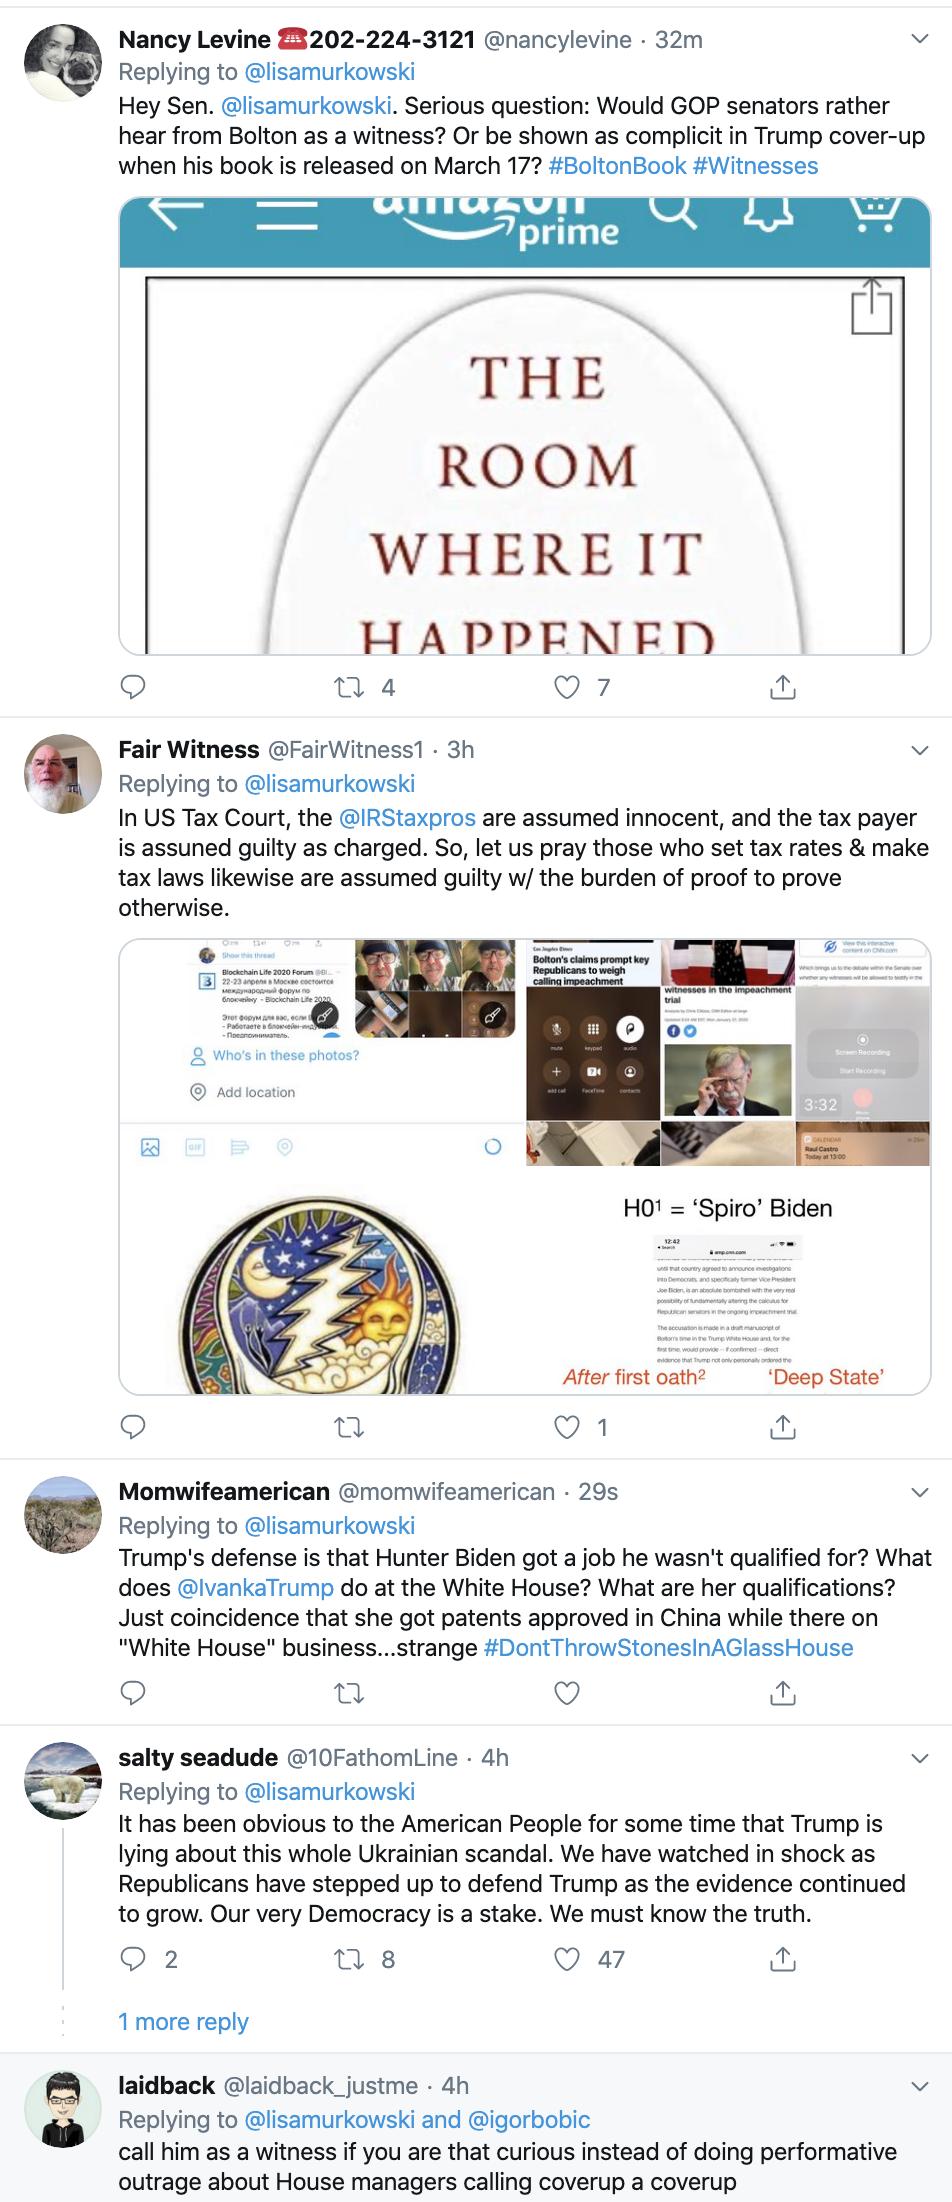 Screen-Shot-2020-01-27-at-4.22.57-PM Trump Livid After Murkowski Responds To Bolton Disclosure Corruption Featured Impeachment Politics Top Stories